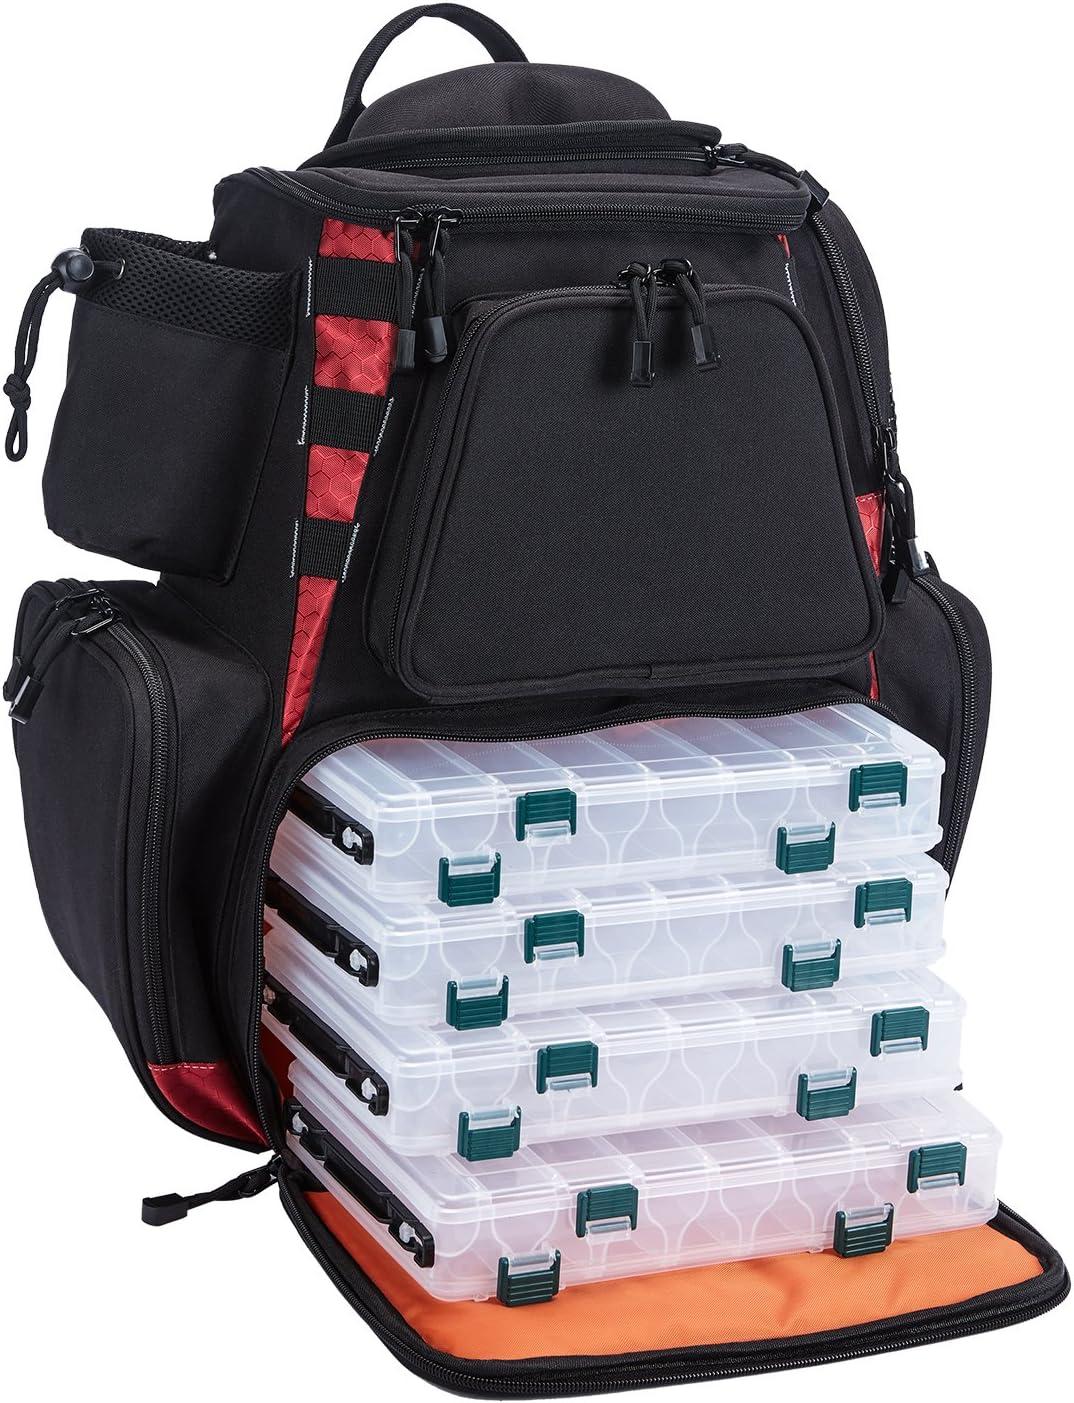 Piscifun fishing tackle backpack large waterproof